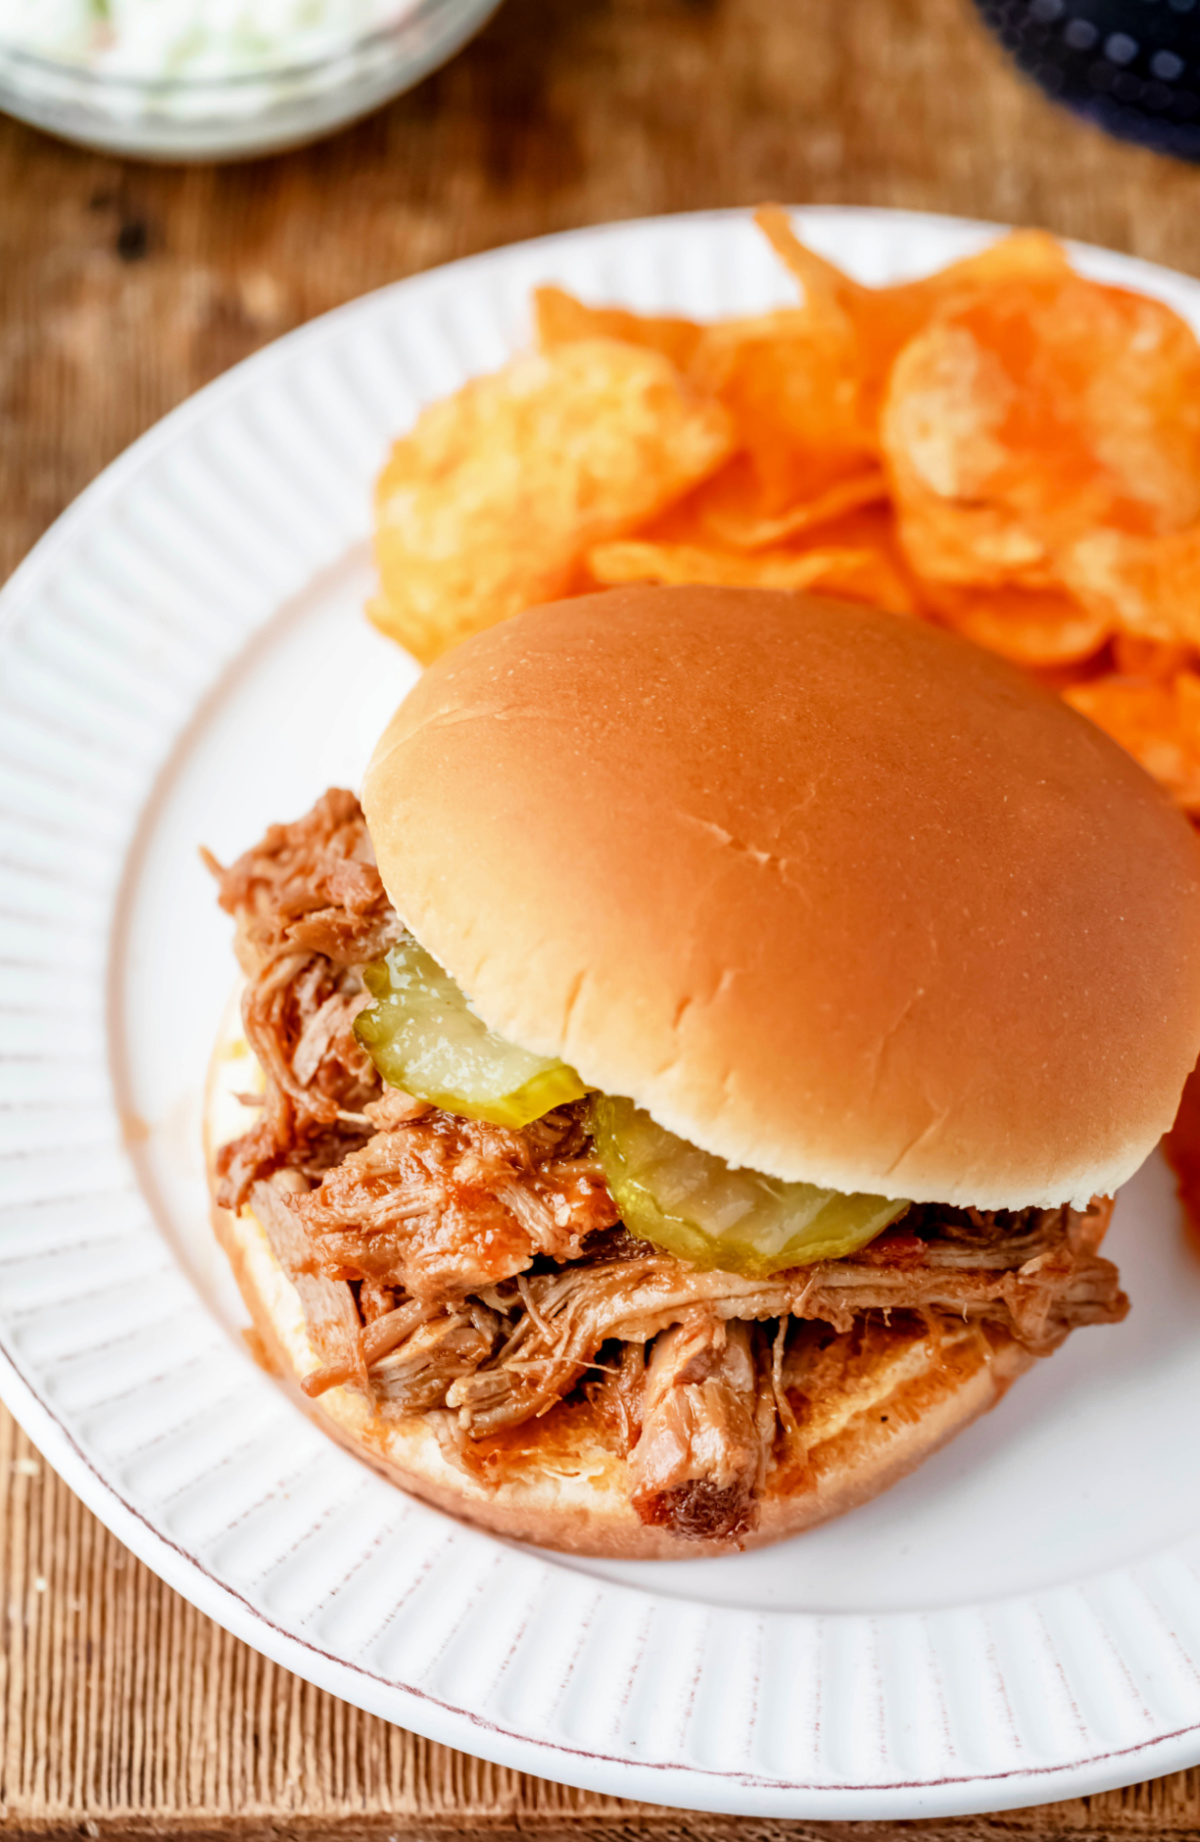 North Carolina style pulled pork on a bun